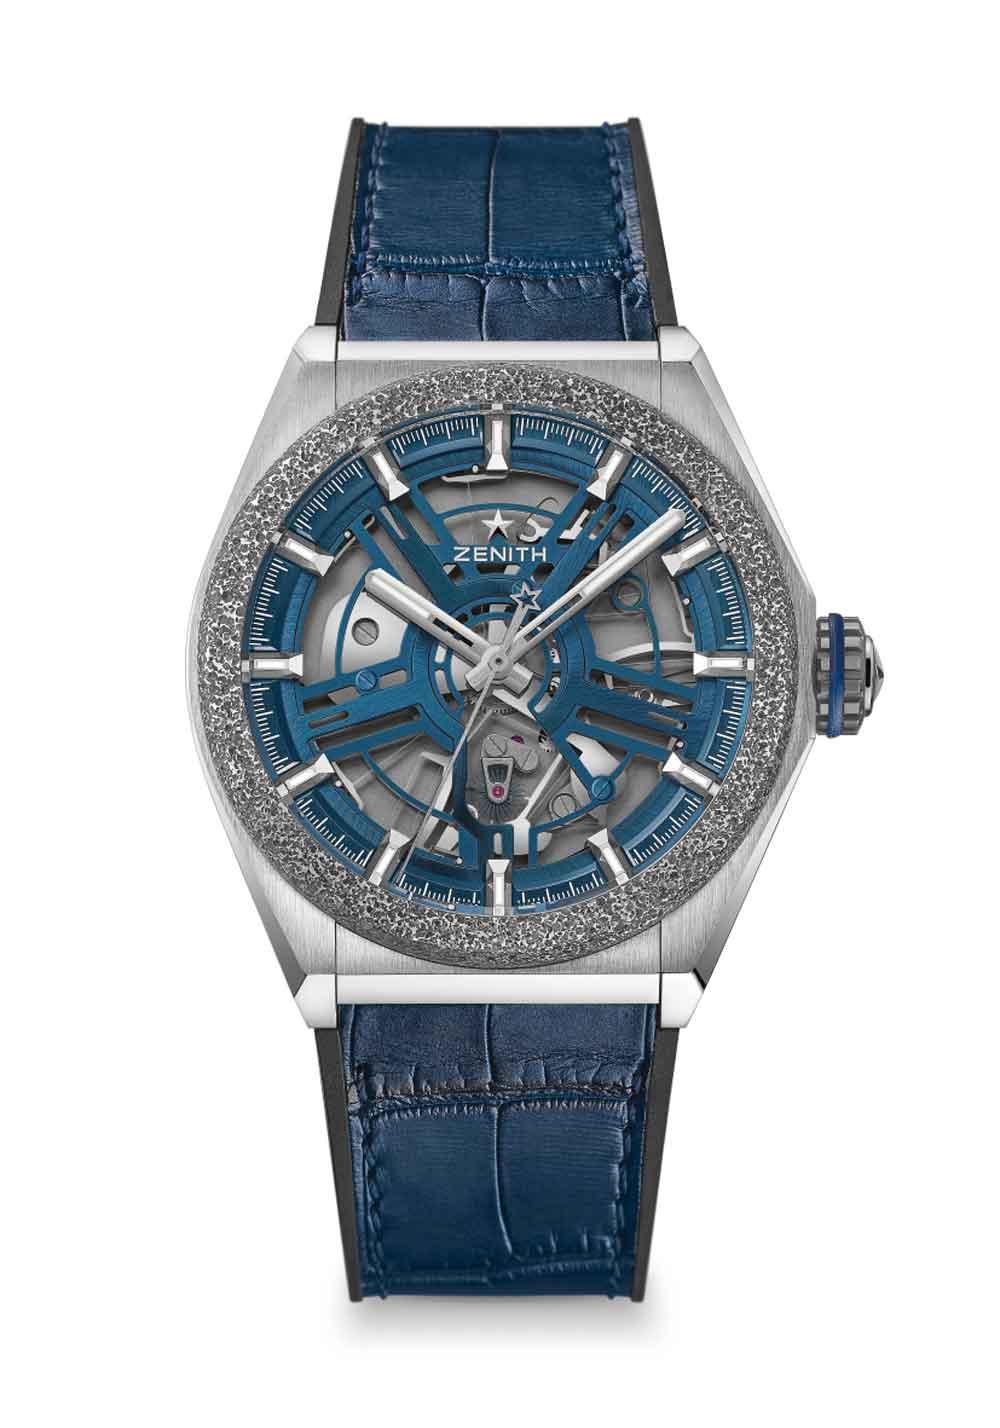 Reloj Zenith Defy Inventor,